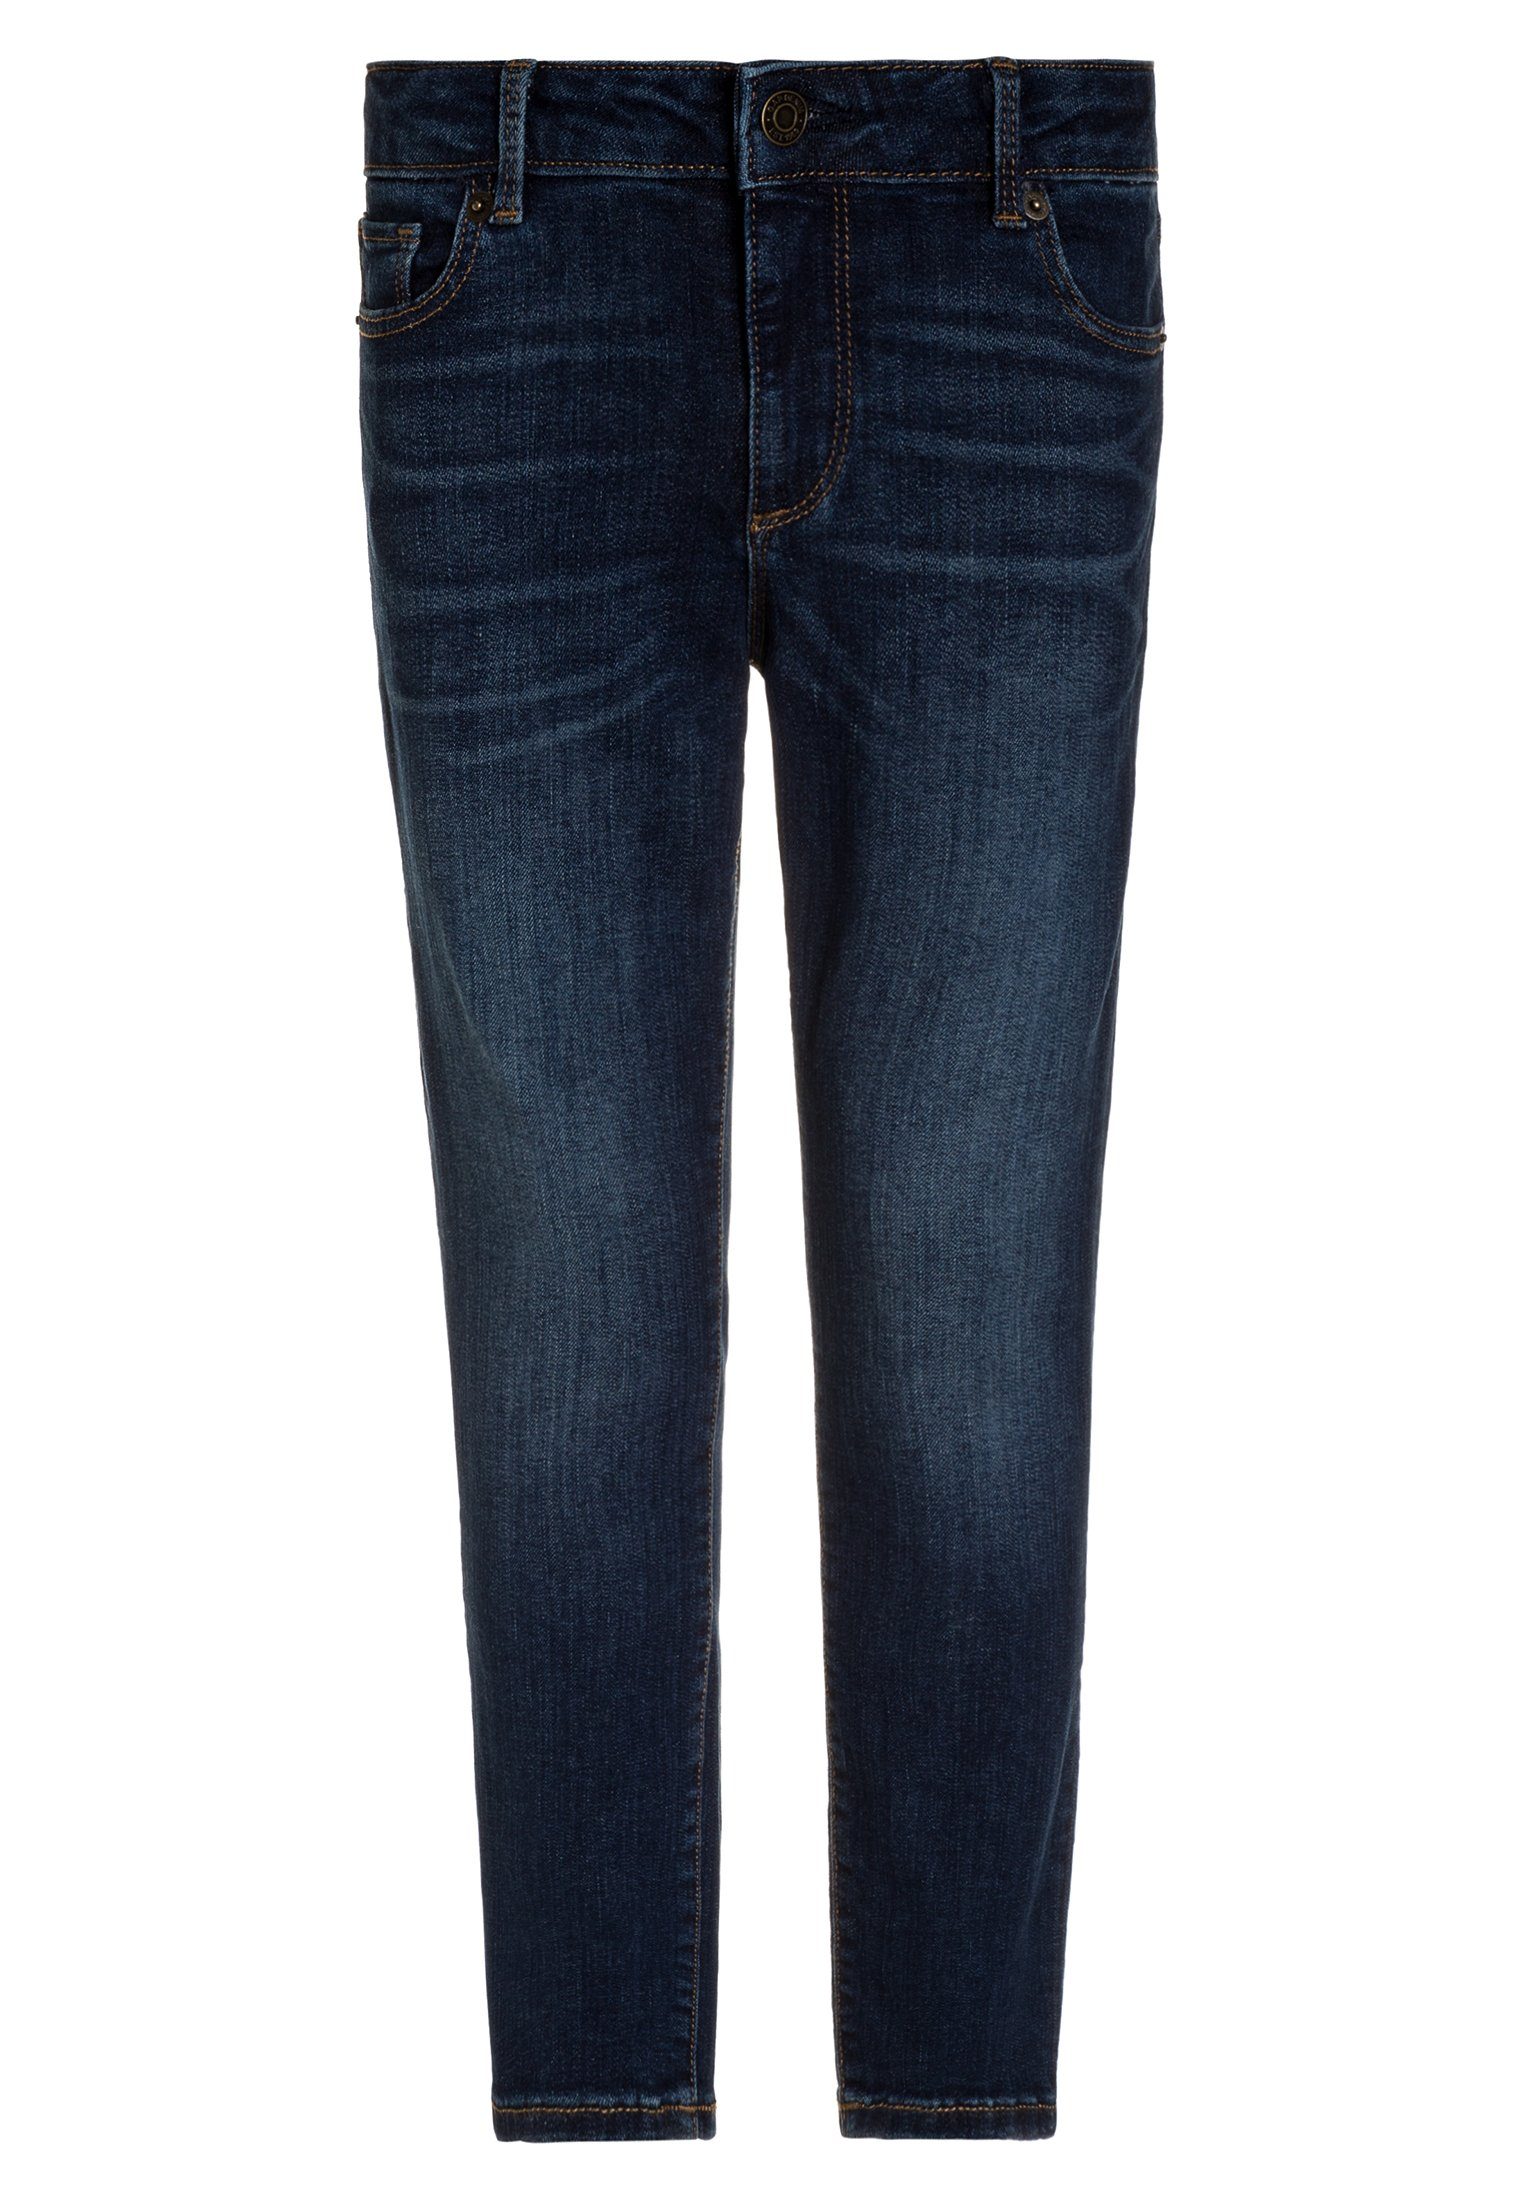 Kids GIRLS BOTTOMS  - Jeans Skinny Fit - dark indigo